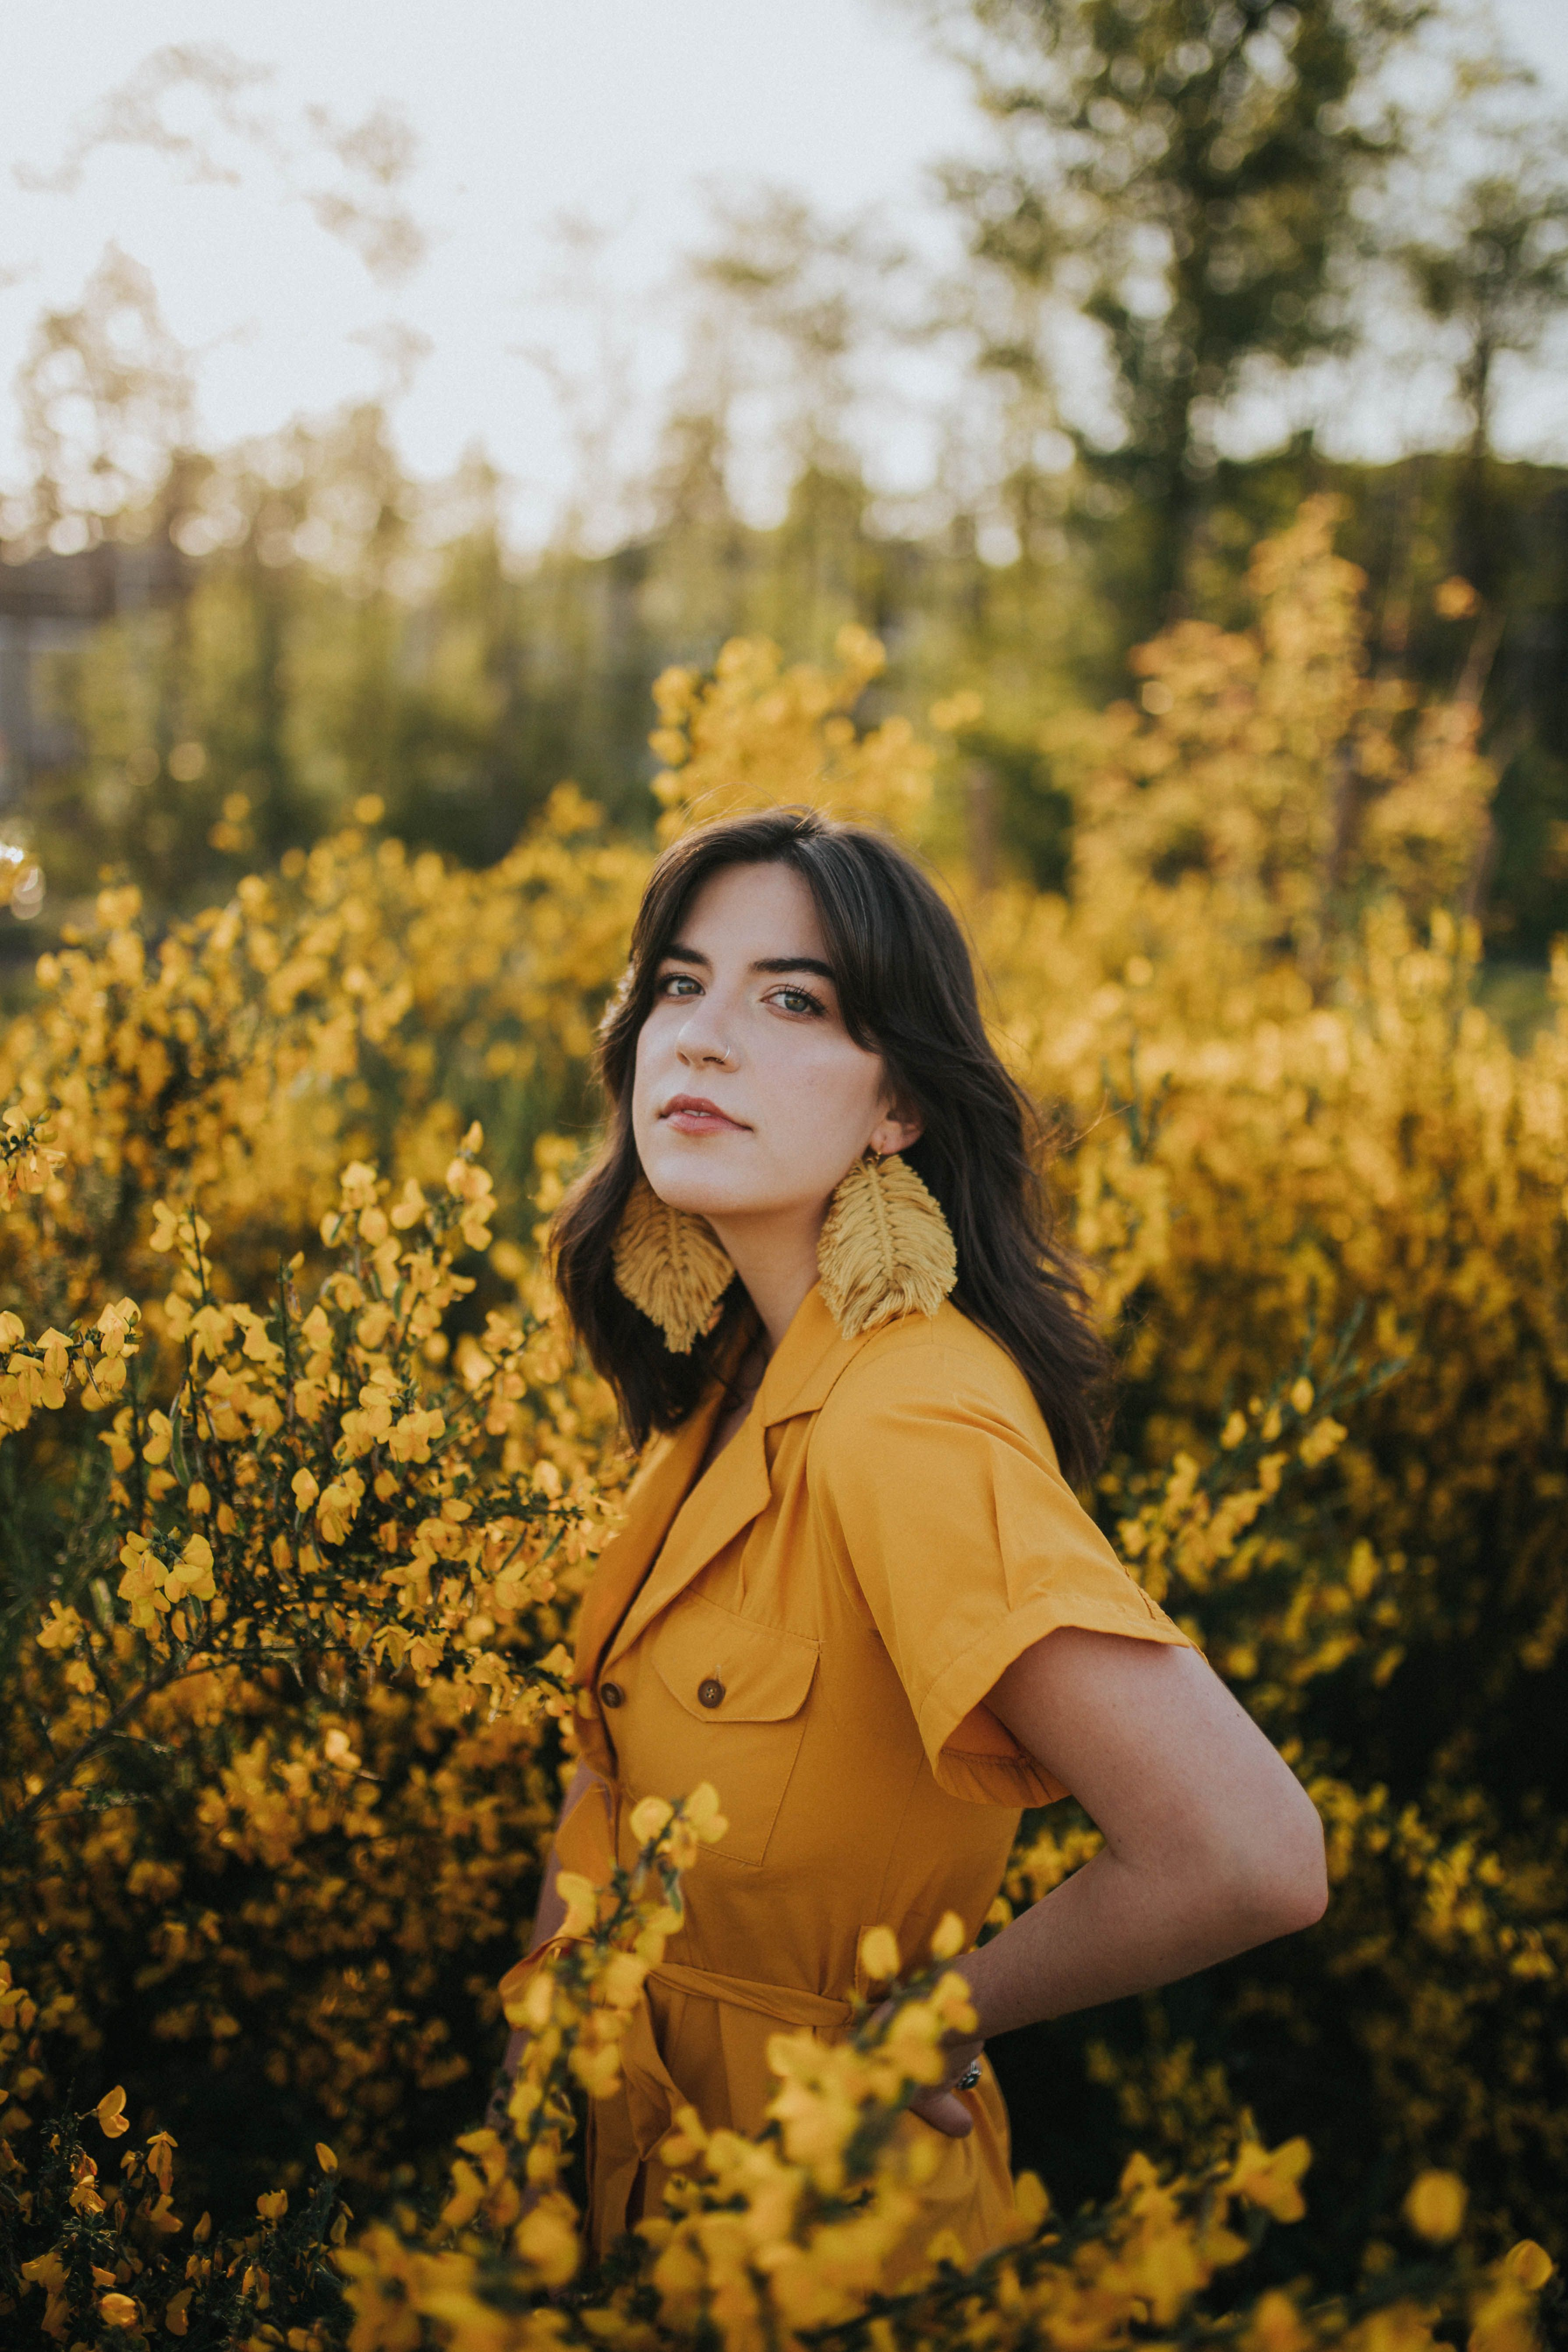 Flower Portrait Photography Portraits With Flowers Backlit Photography Pnw Photography Flower Photoshoot Yellow Portrait Photography Yellow Portrait